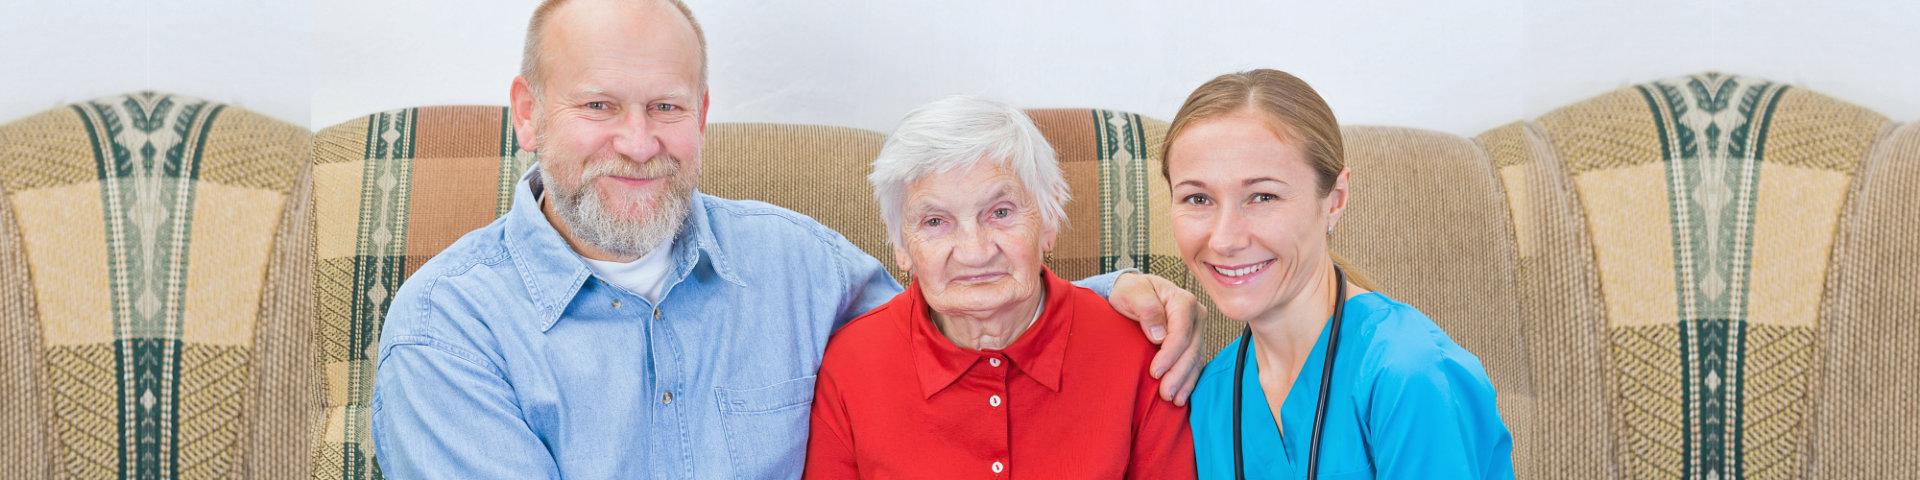 senior couple and a nurse